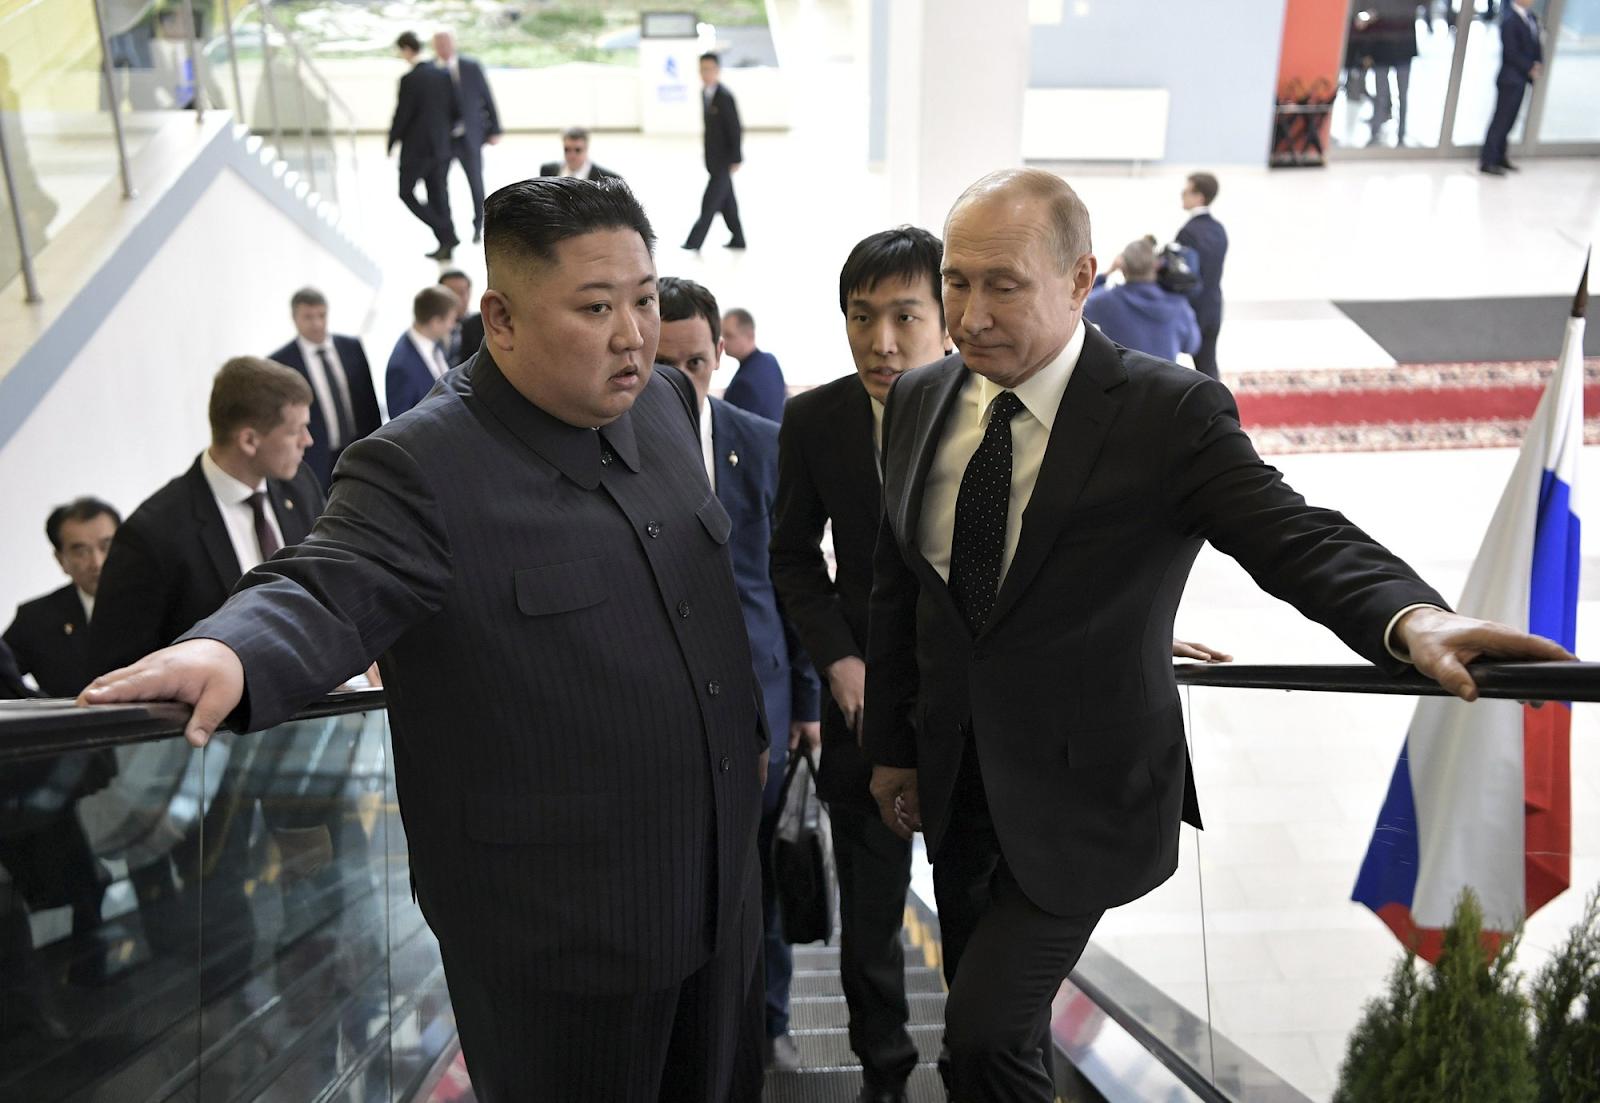 North Korean Supreme Leader Kim Jong-un (left) and Russian President Vladimir Putin (right) take an escalator to the room for their talks in Vladivostok, Russia, on April 25, 2019. Photo:  Alexei Nokolsky/Sputnik, Kremlin Photo Pool via AP